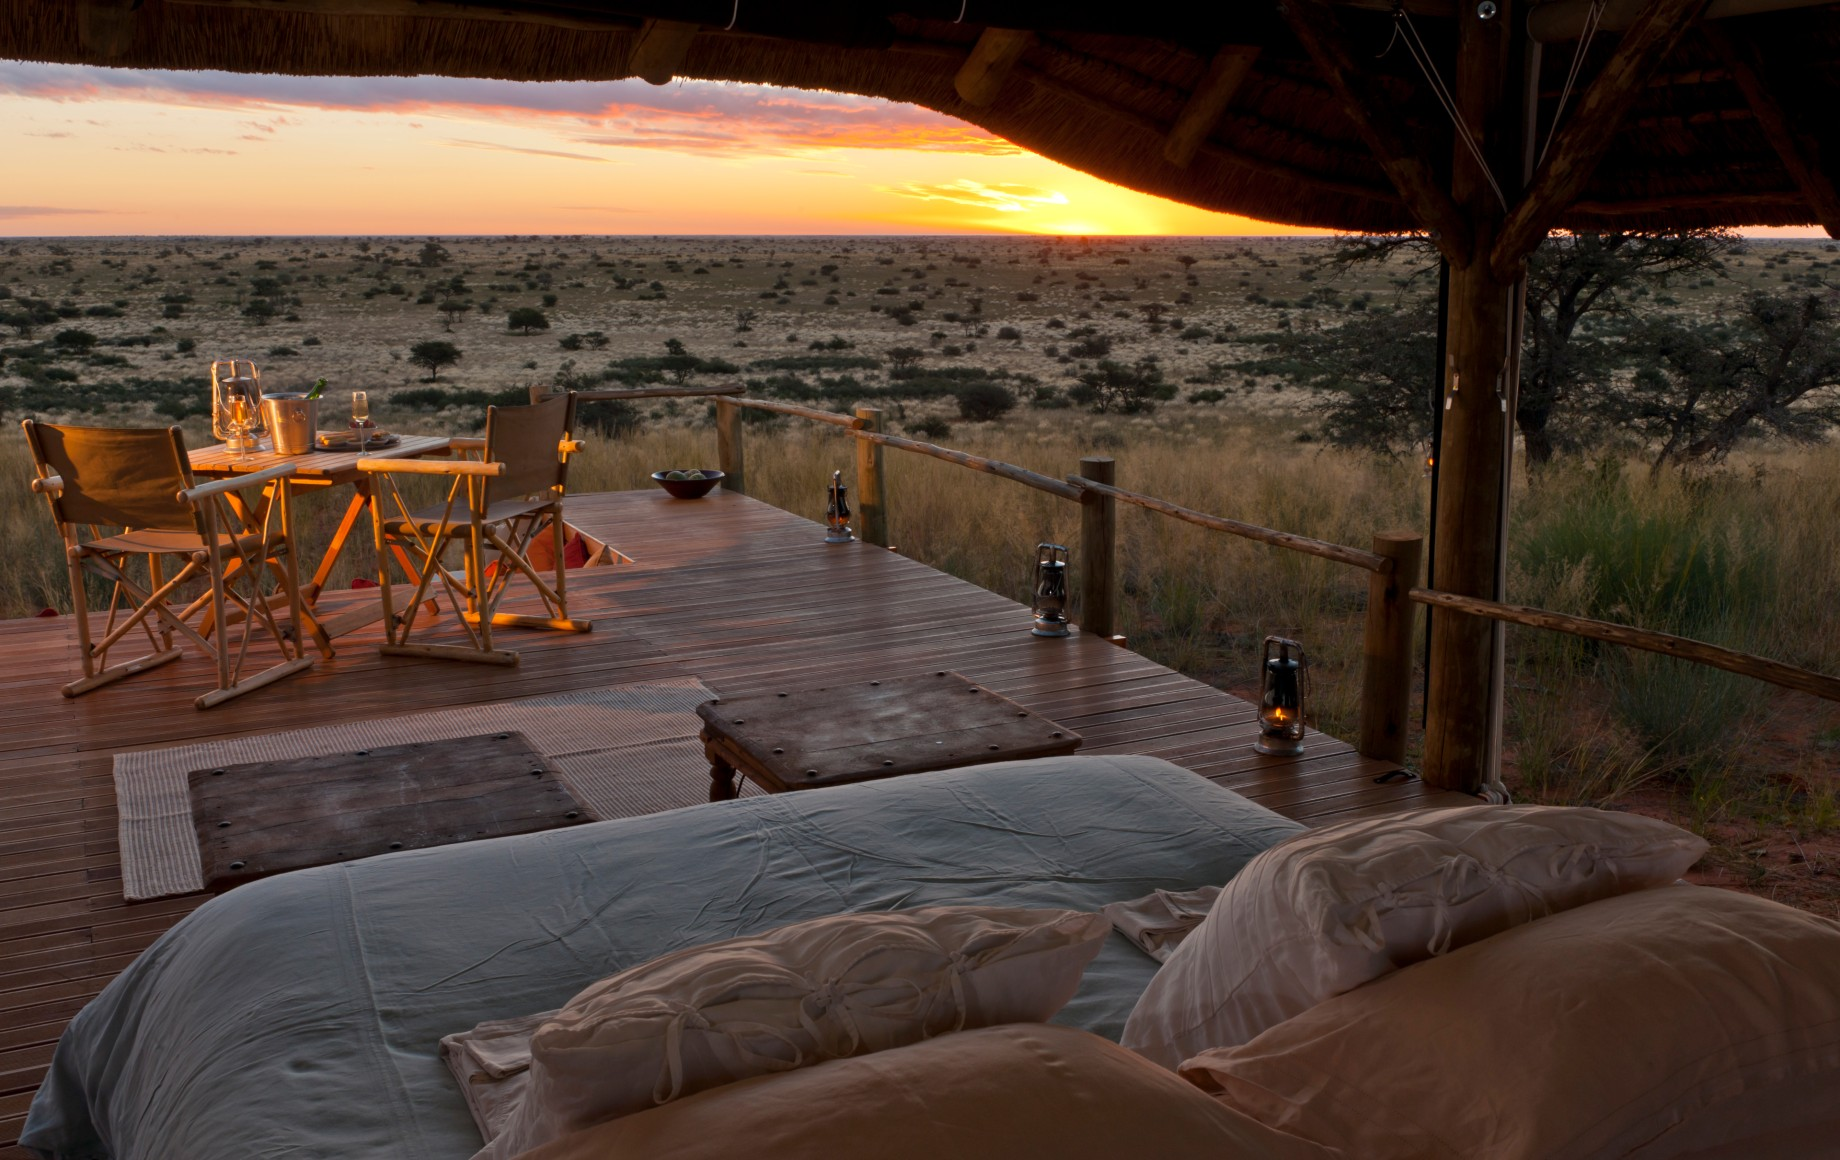 bed overlooking the savannah at Tswalu Motse